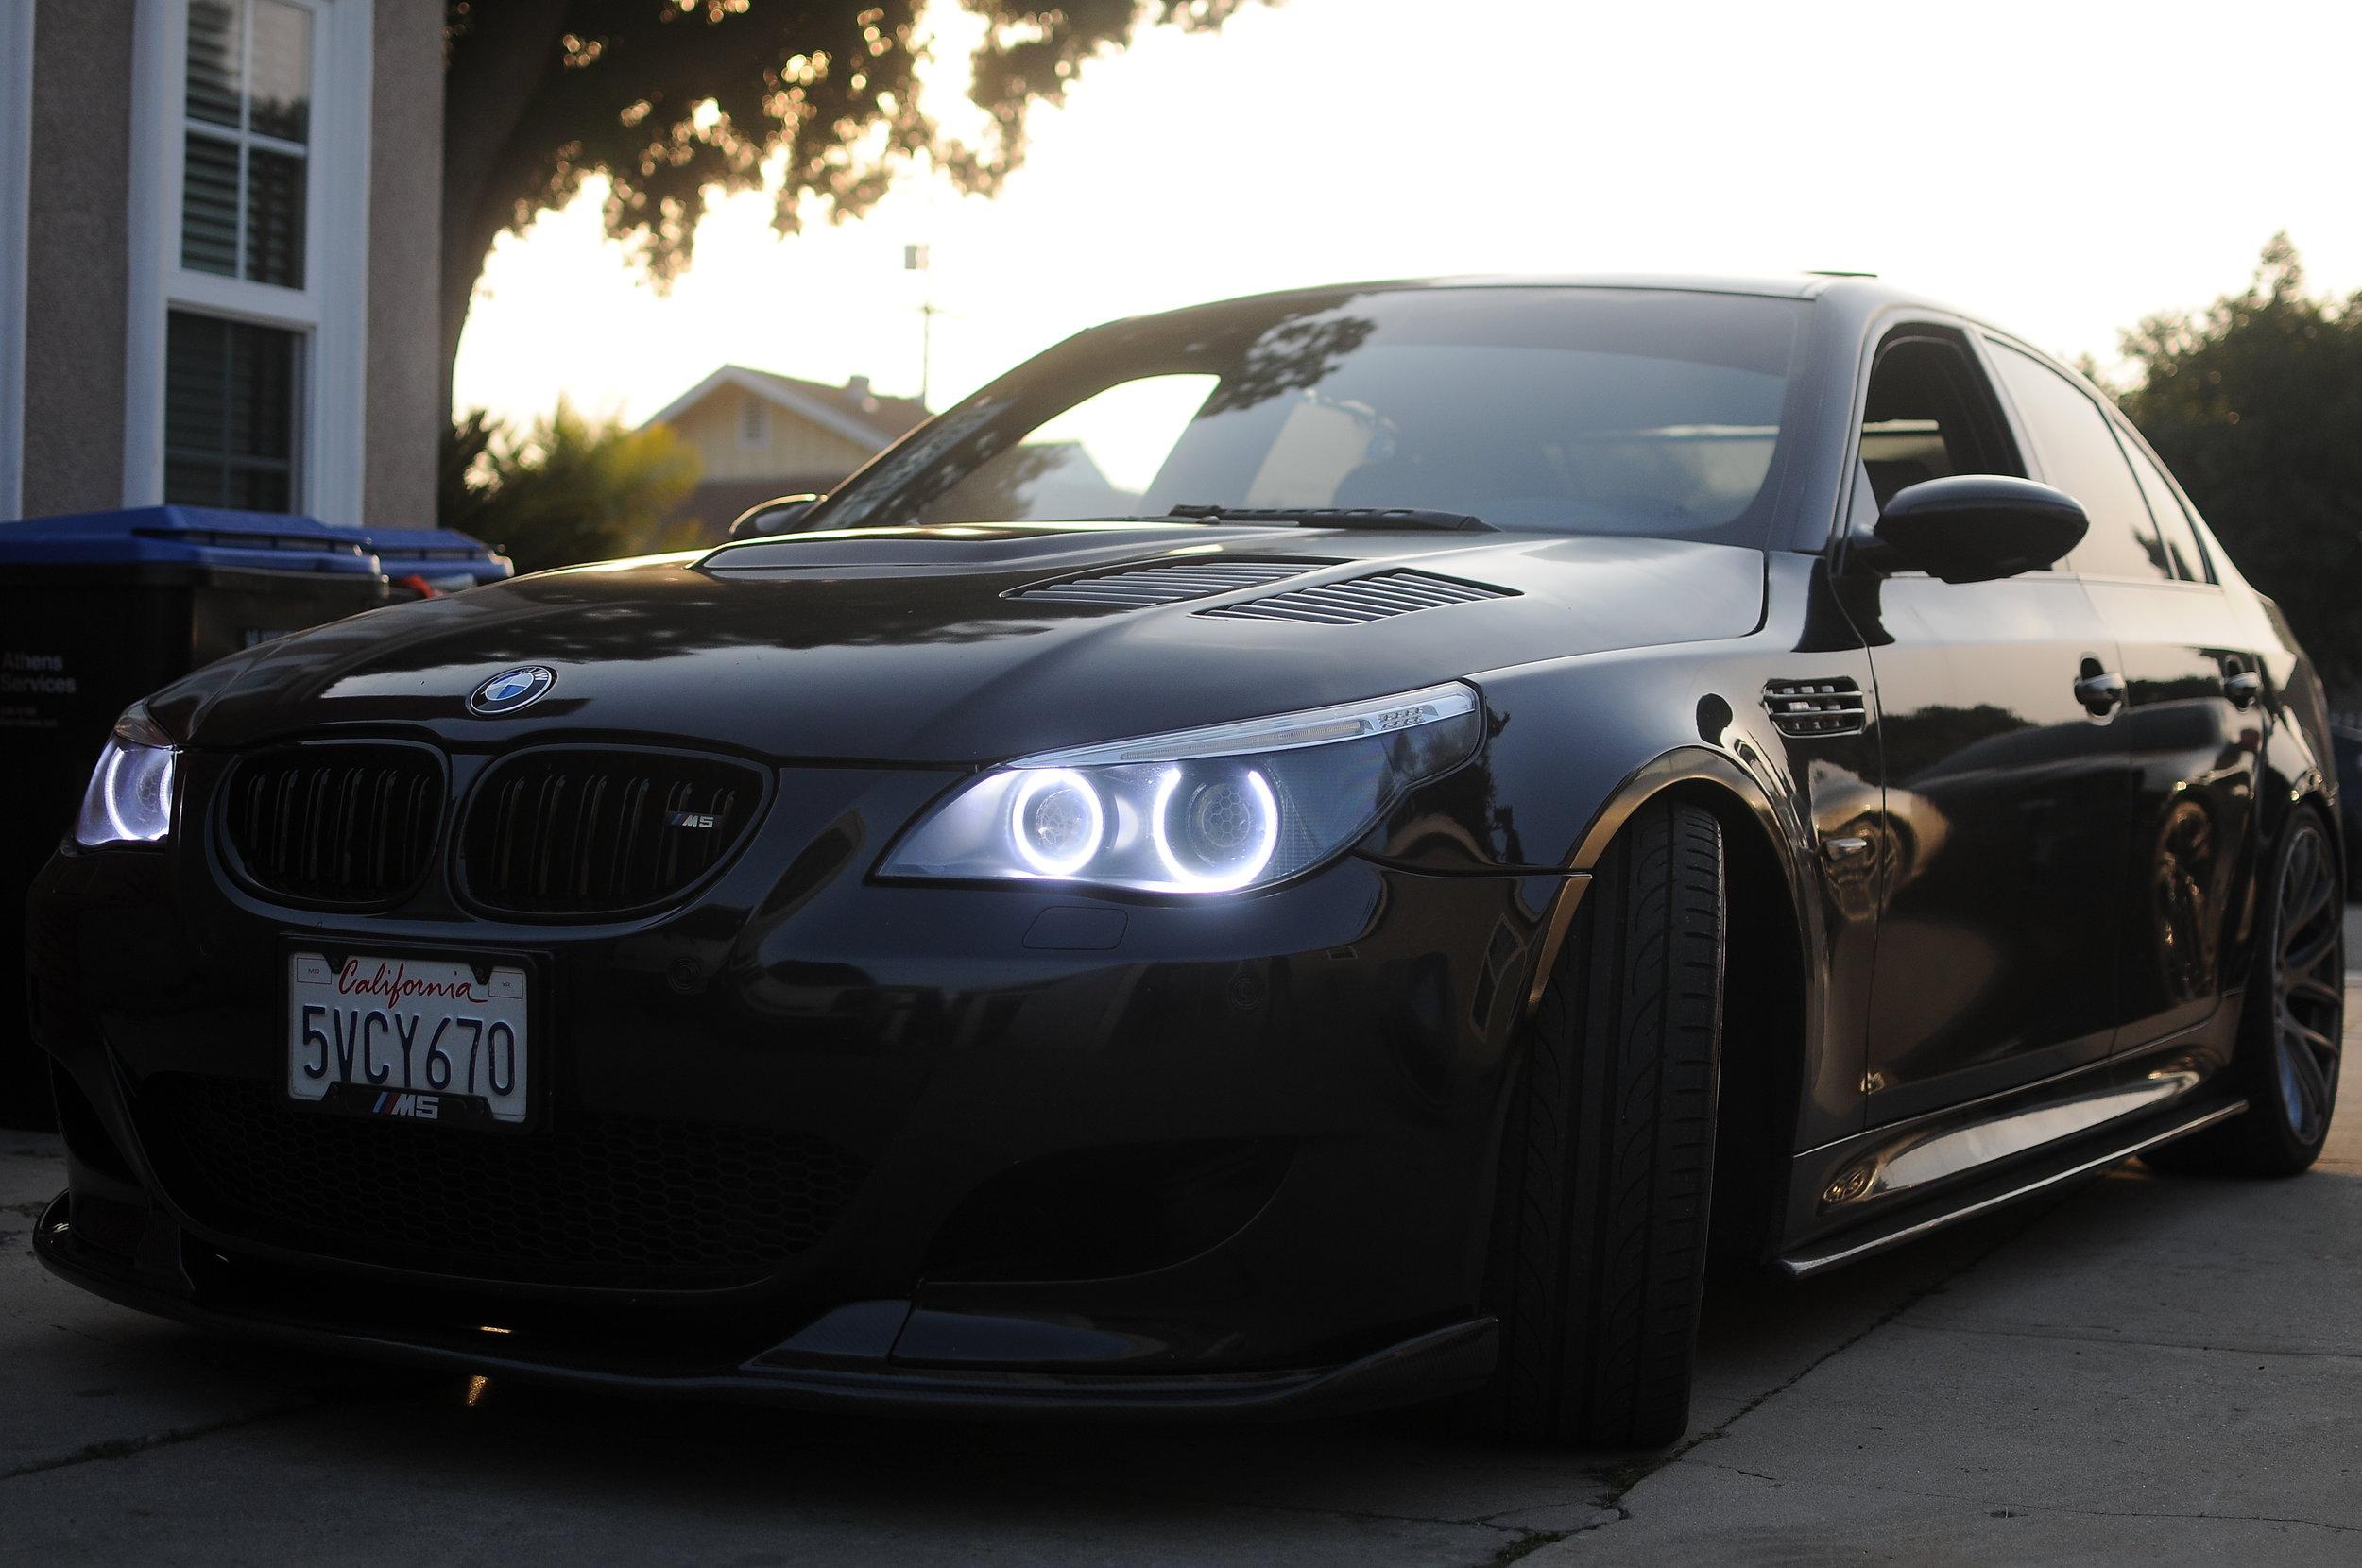 Bmw M5 E60 Metallic Black Evil Headlights Custom Retrofitting Service In Southern California